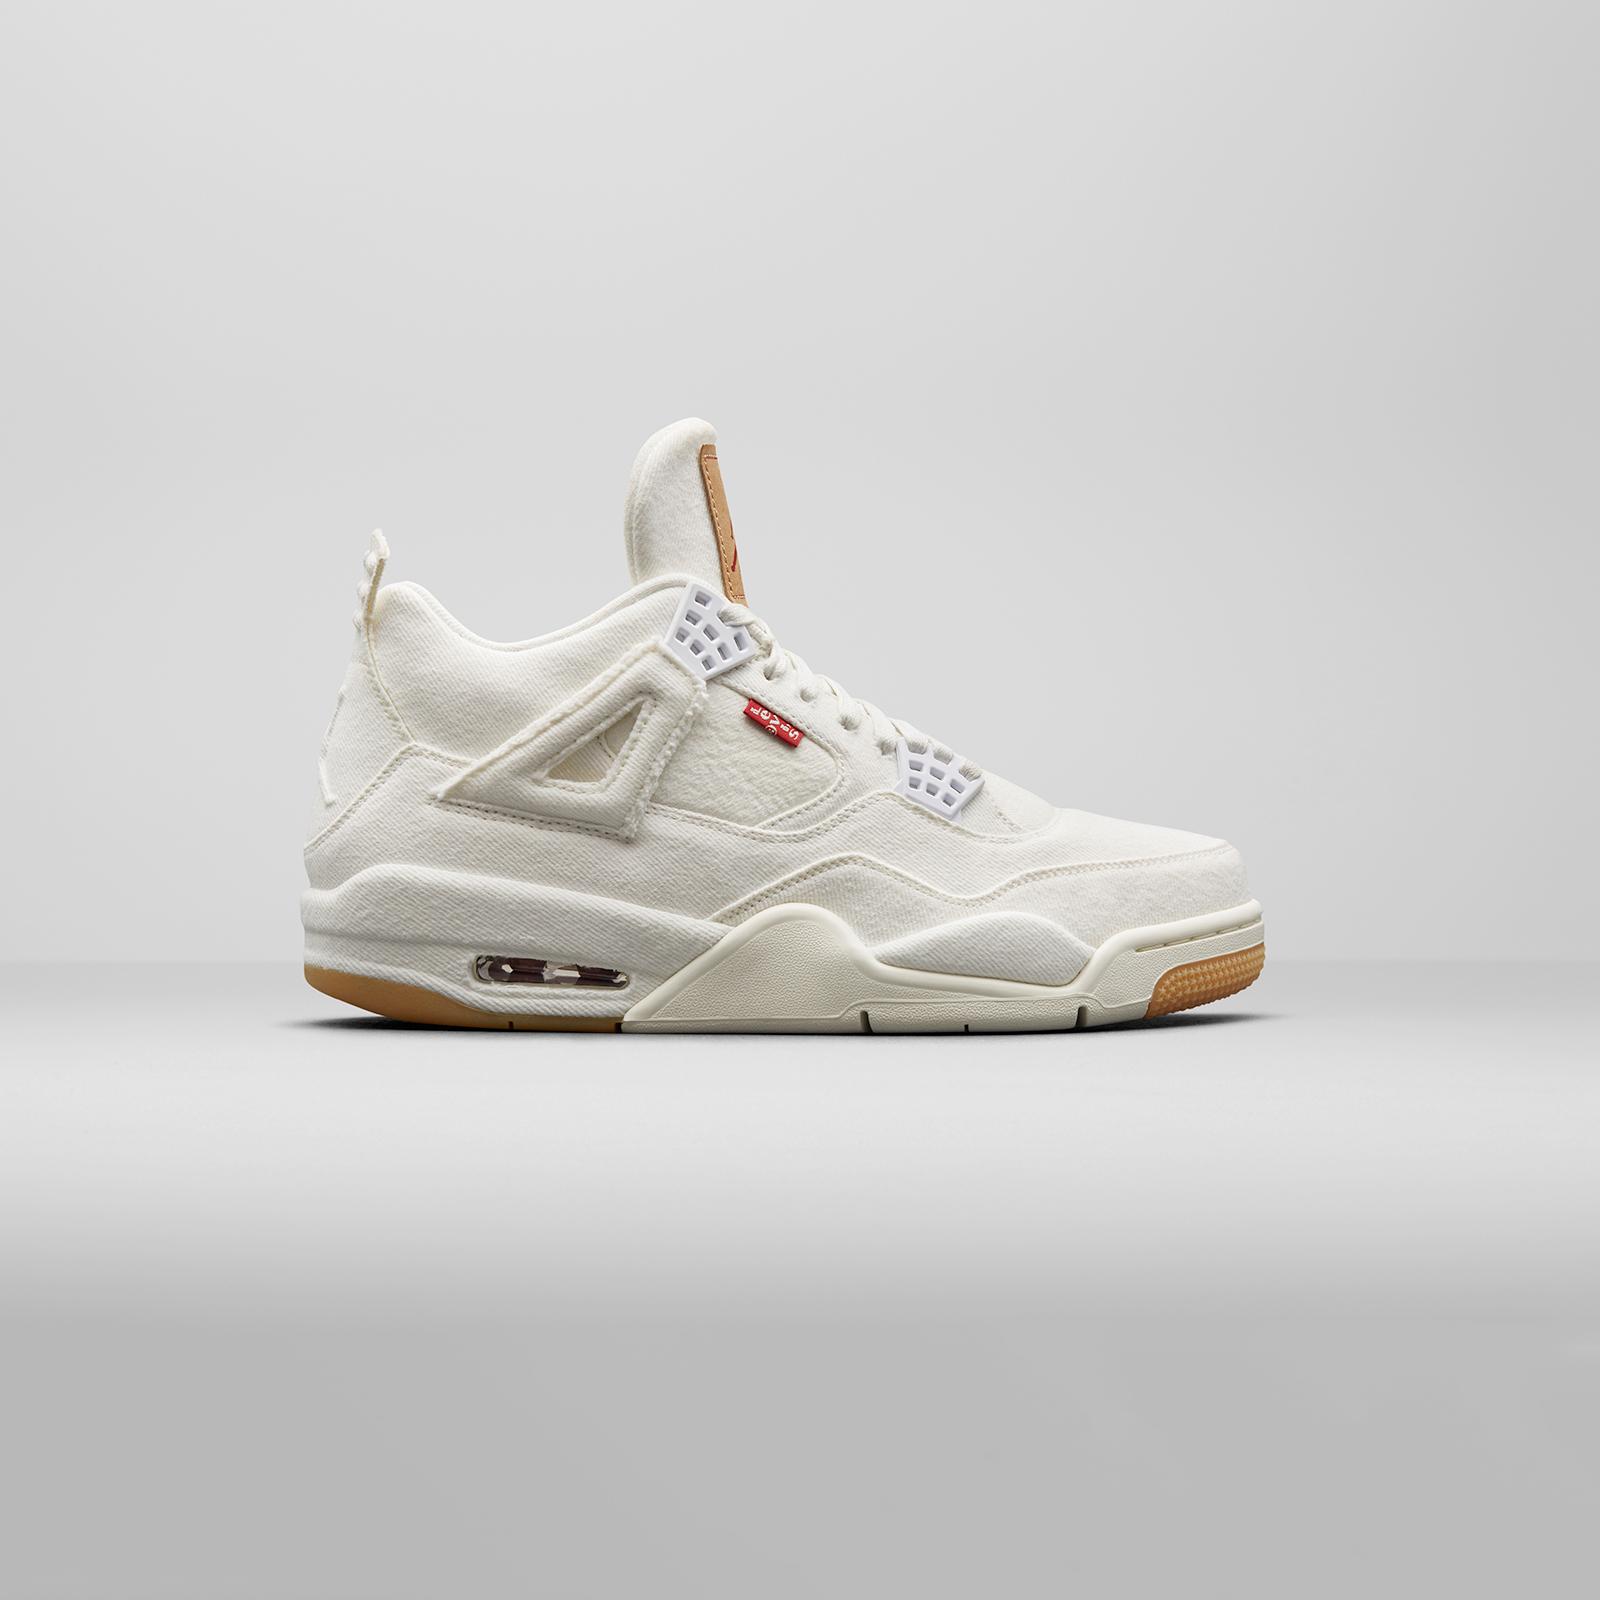 Nike Air Jordan 4 Retro Levis NRG